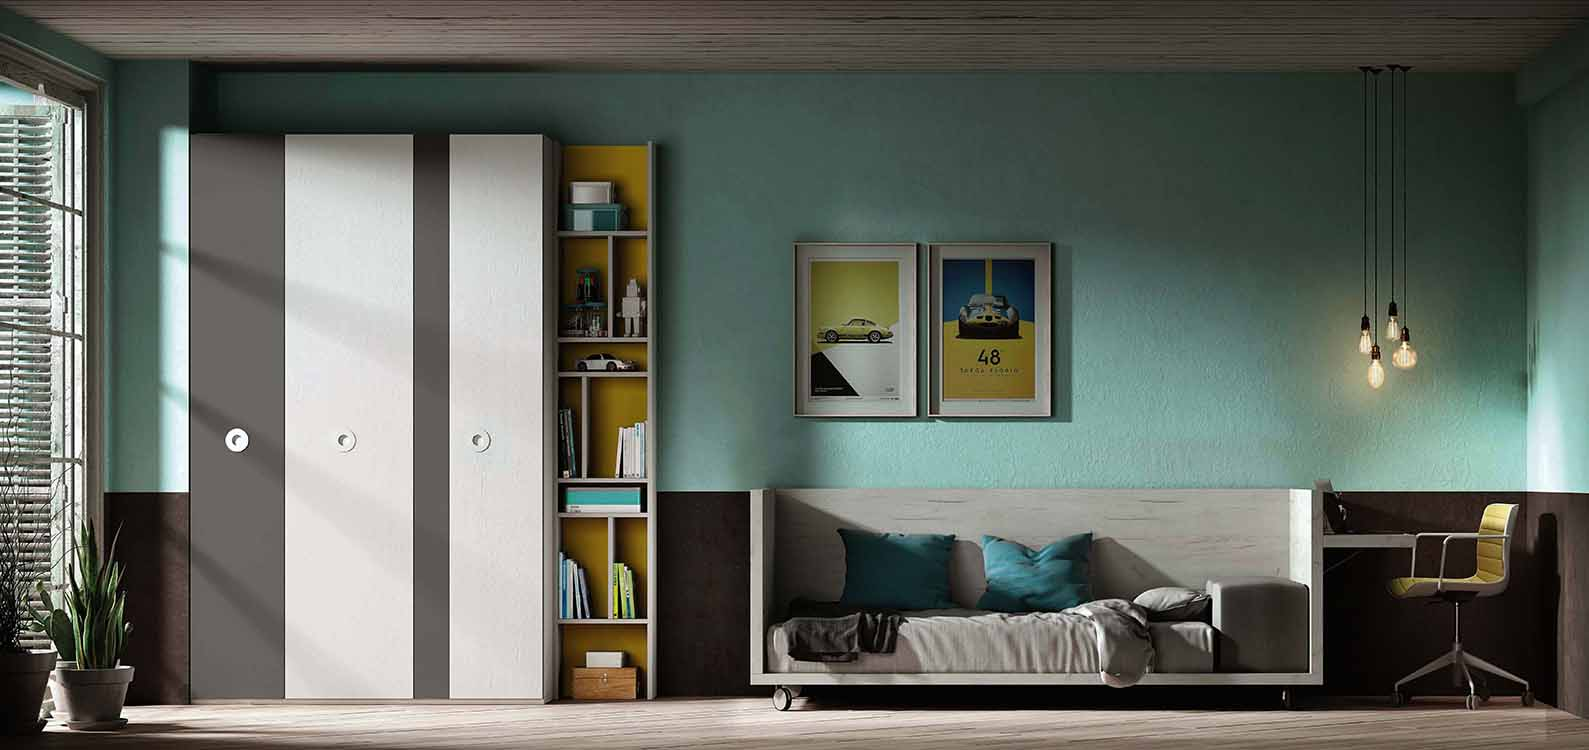 http://www.munozmuebles.net/nueva/catalogo/juveniles-modulares.html -  Espectaculares muebles prácticos